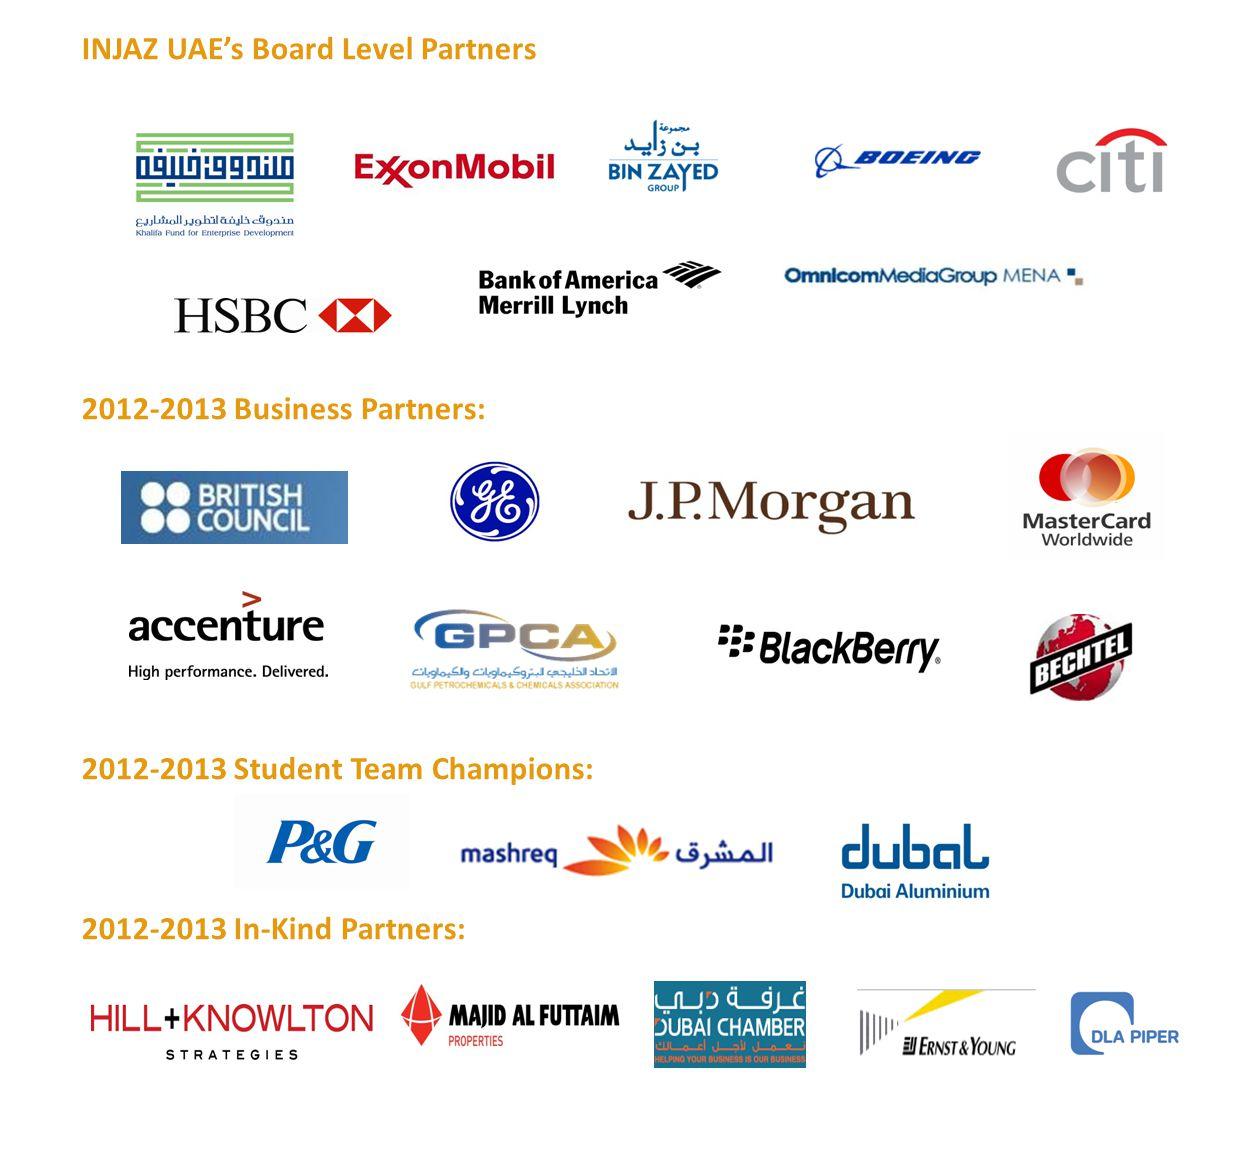 INJAZ UAE's Board Level Partners 2012-2013 Business Partners: 2012-2013 Student Team Champions: 2012-2013 In-Kind Partners: INJAZ UAE's in-kind Supporters: